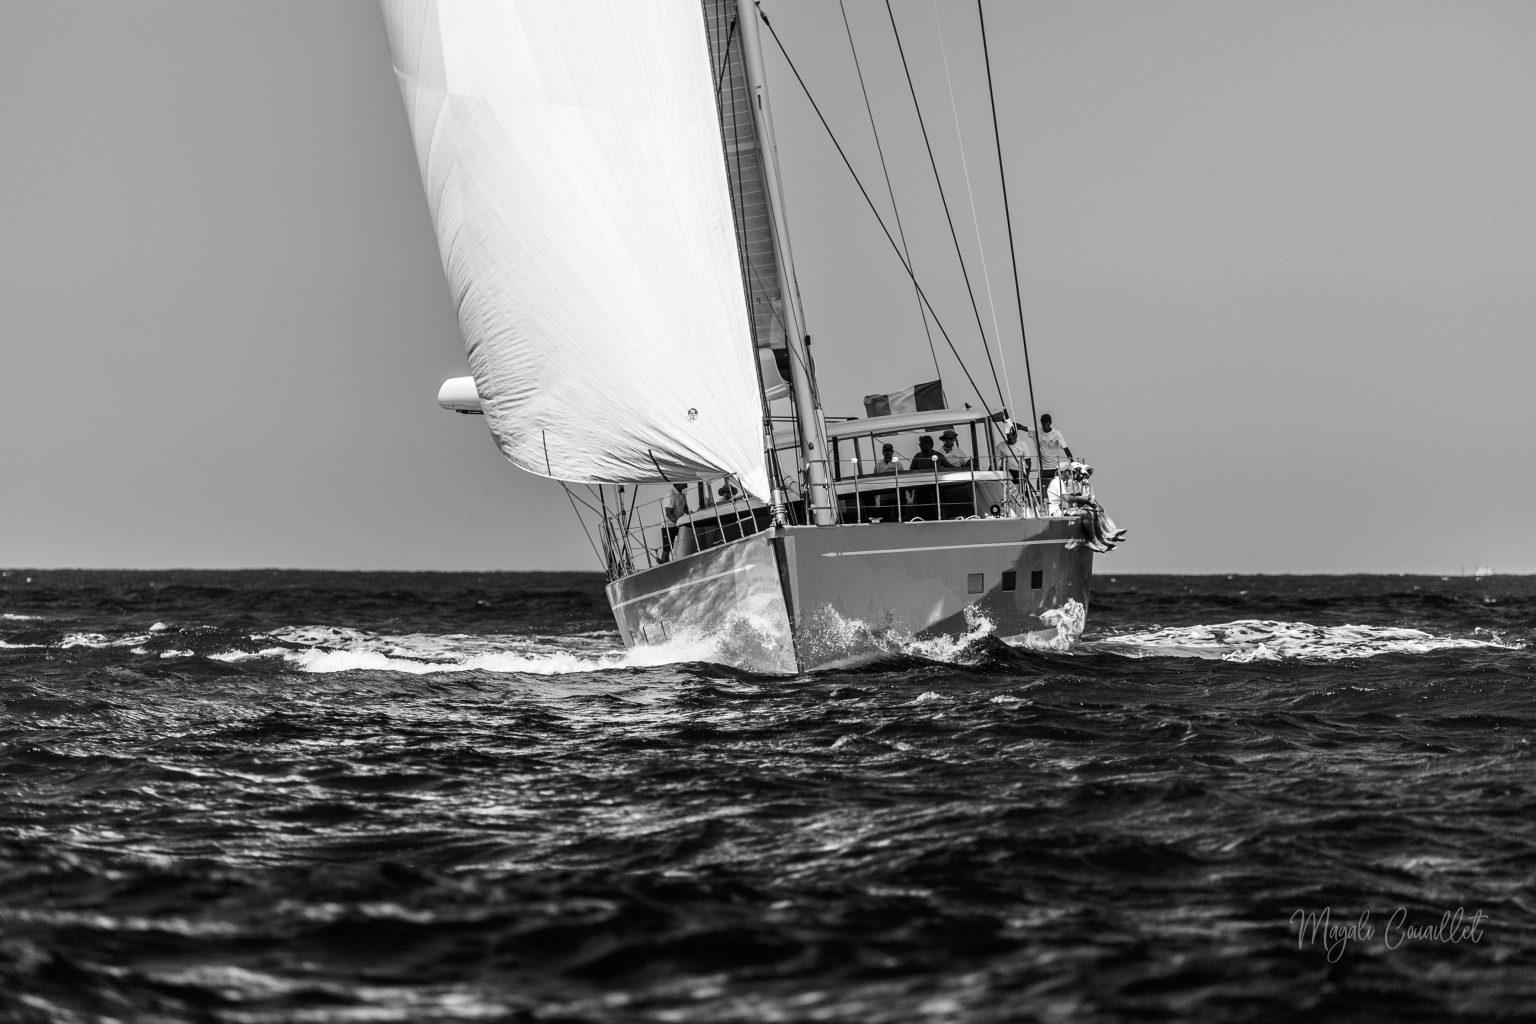 Lir Yacht, Bucket Regatta 2019 St Barths